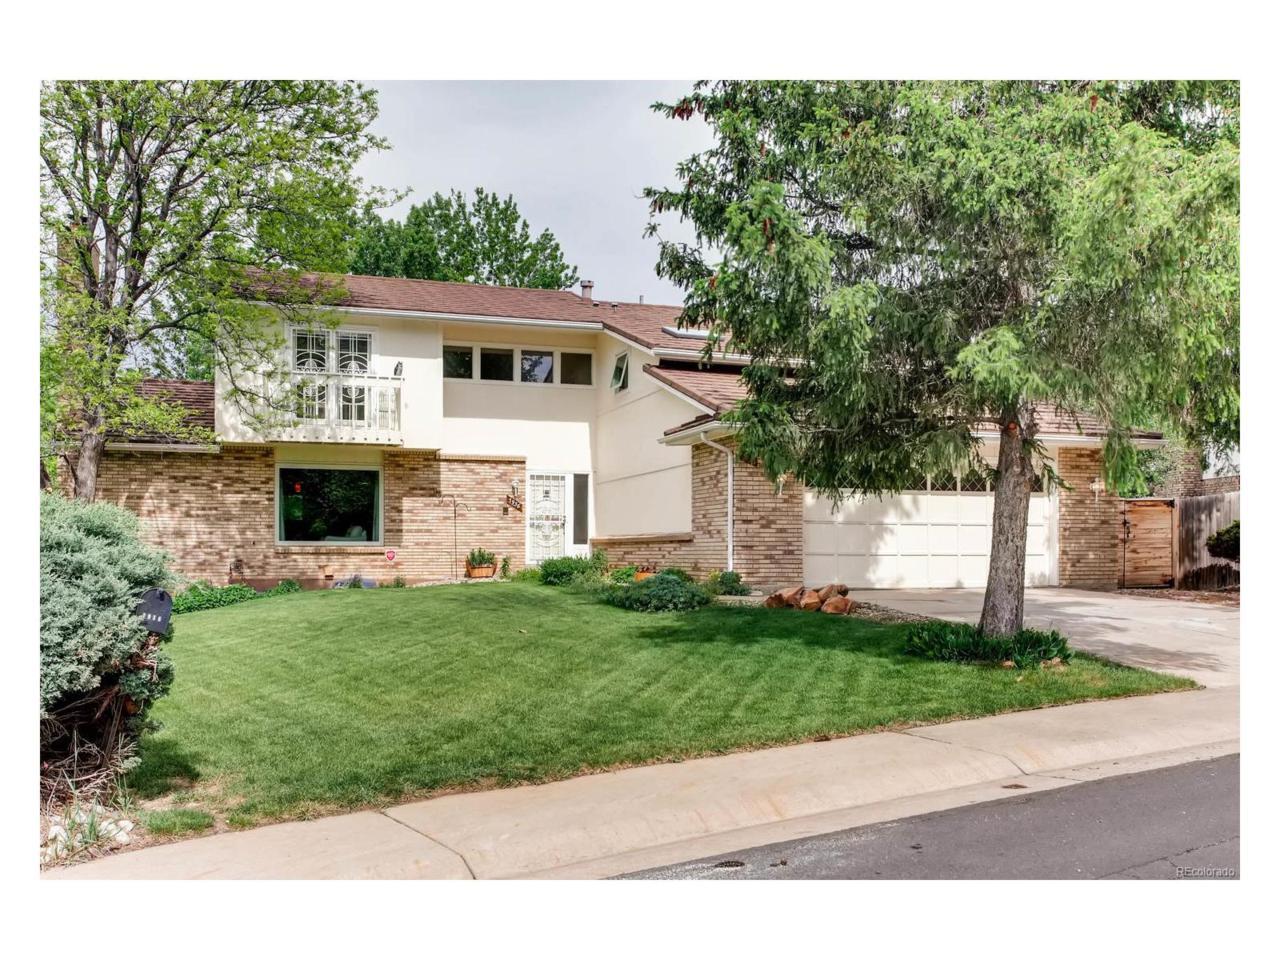 7936 S Saulsbury Street, Littleton, CO 80128 (MLS #9406710) :: 8z Real Estate